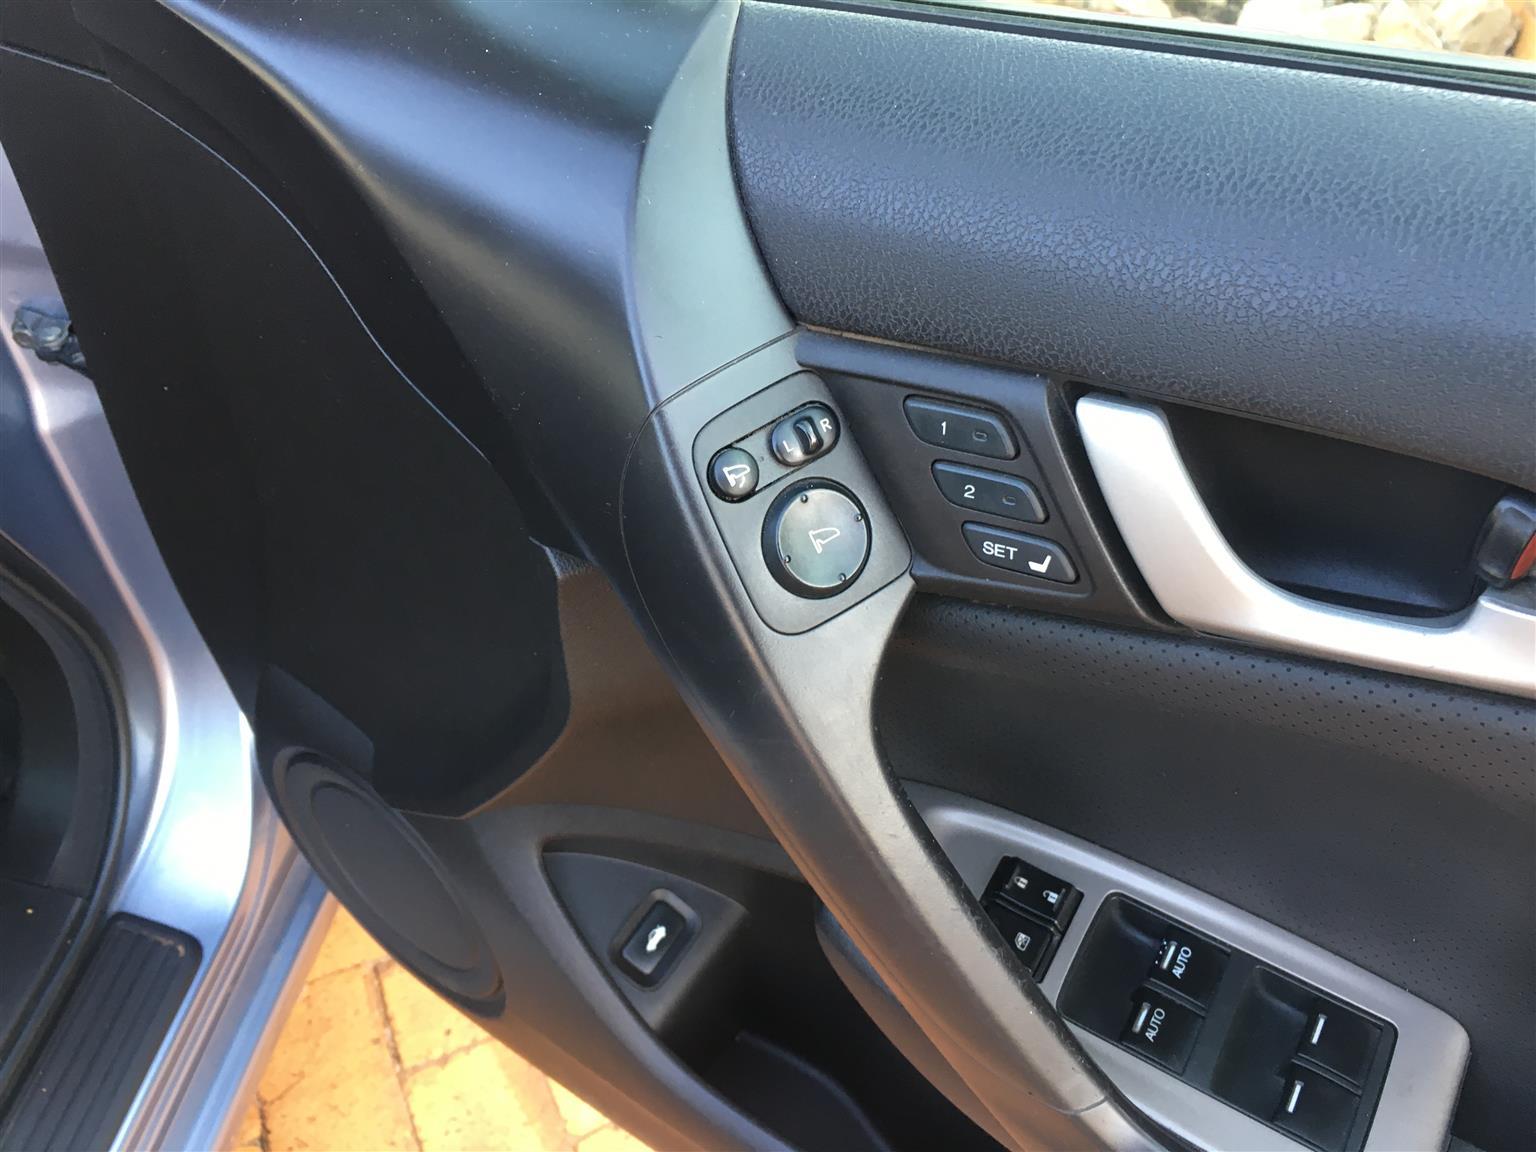 2008 Honda Accord 2.0 Executive automatic